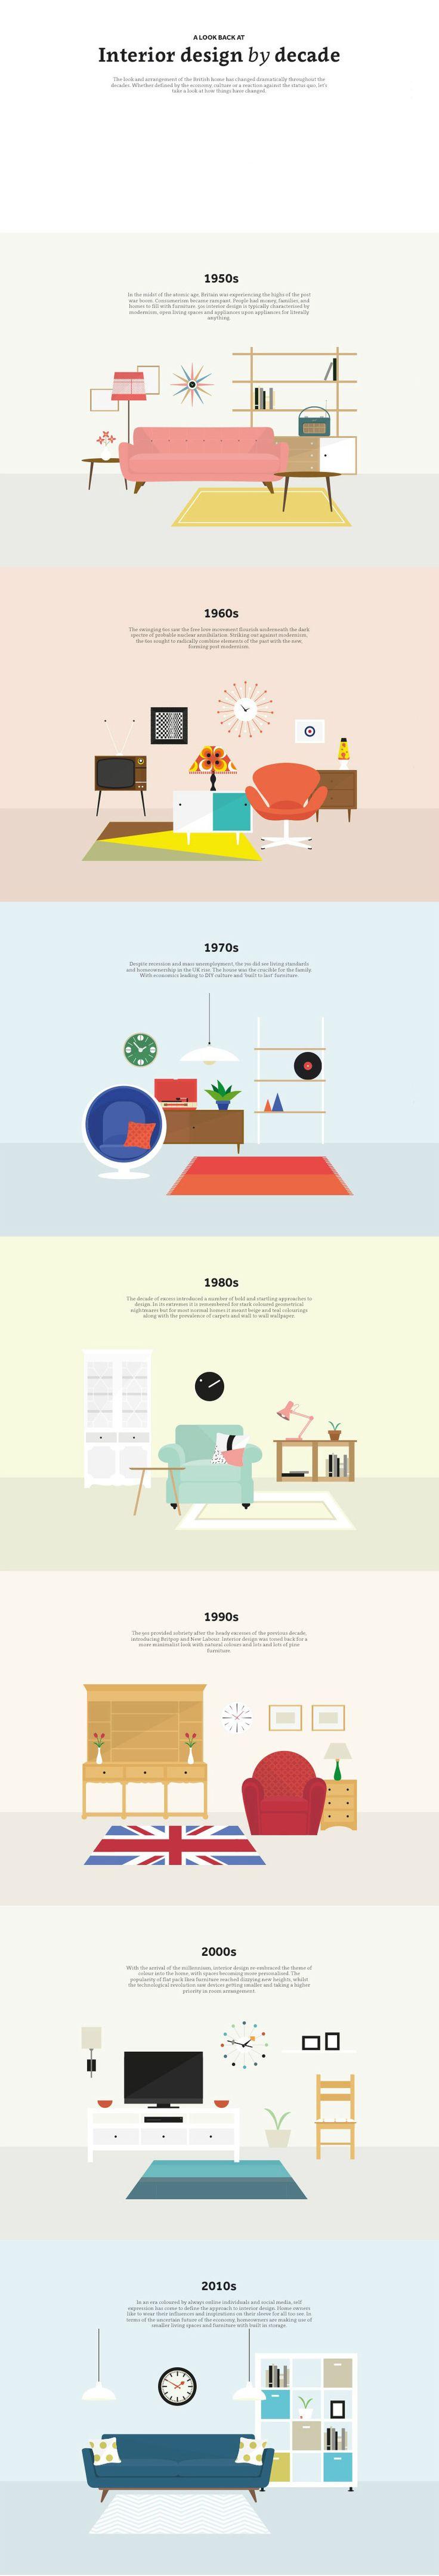 Interior Design By Decade | Visual.ly